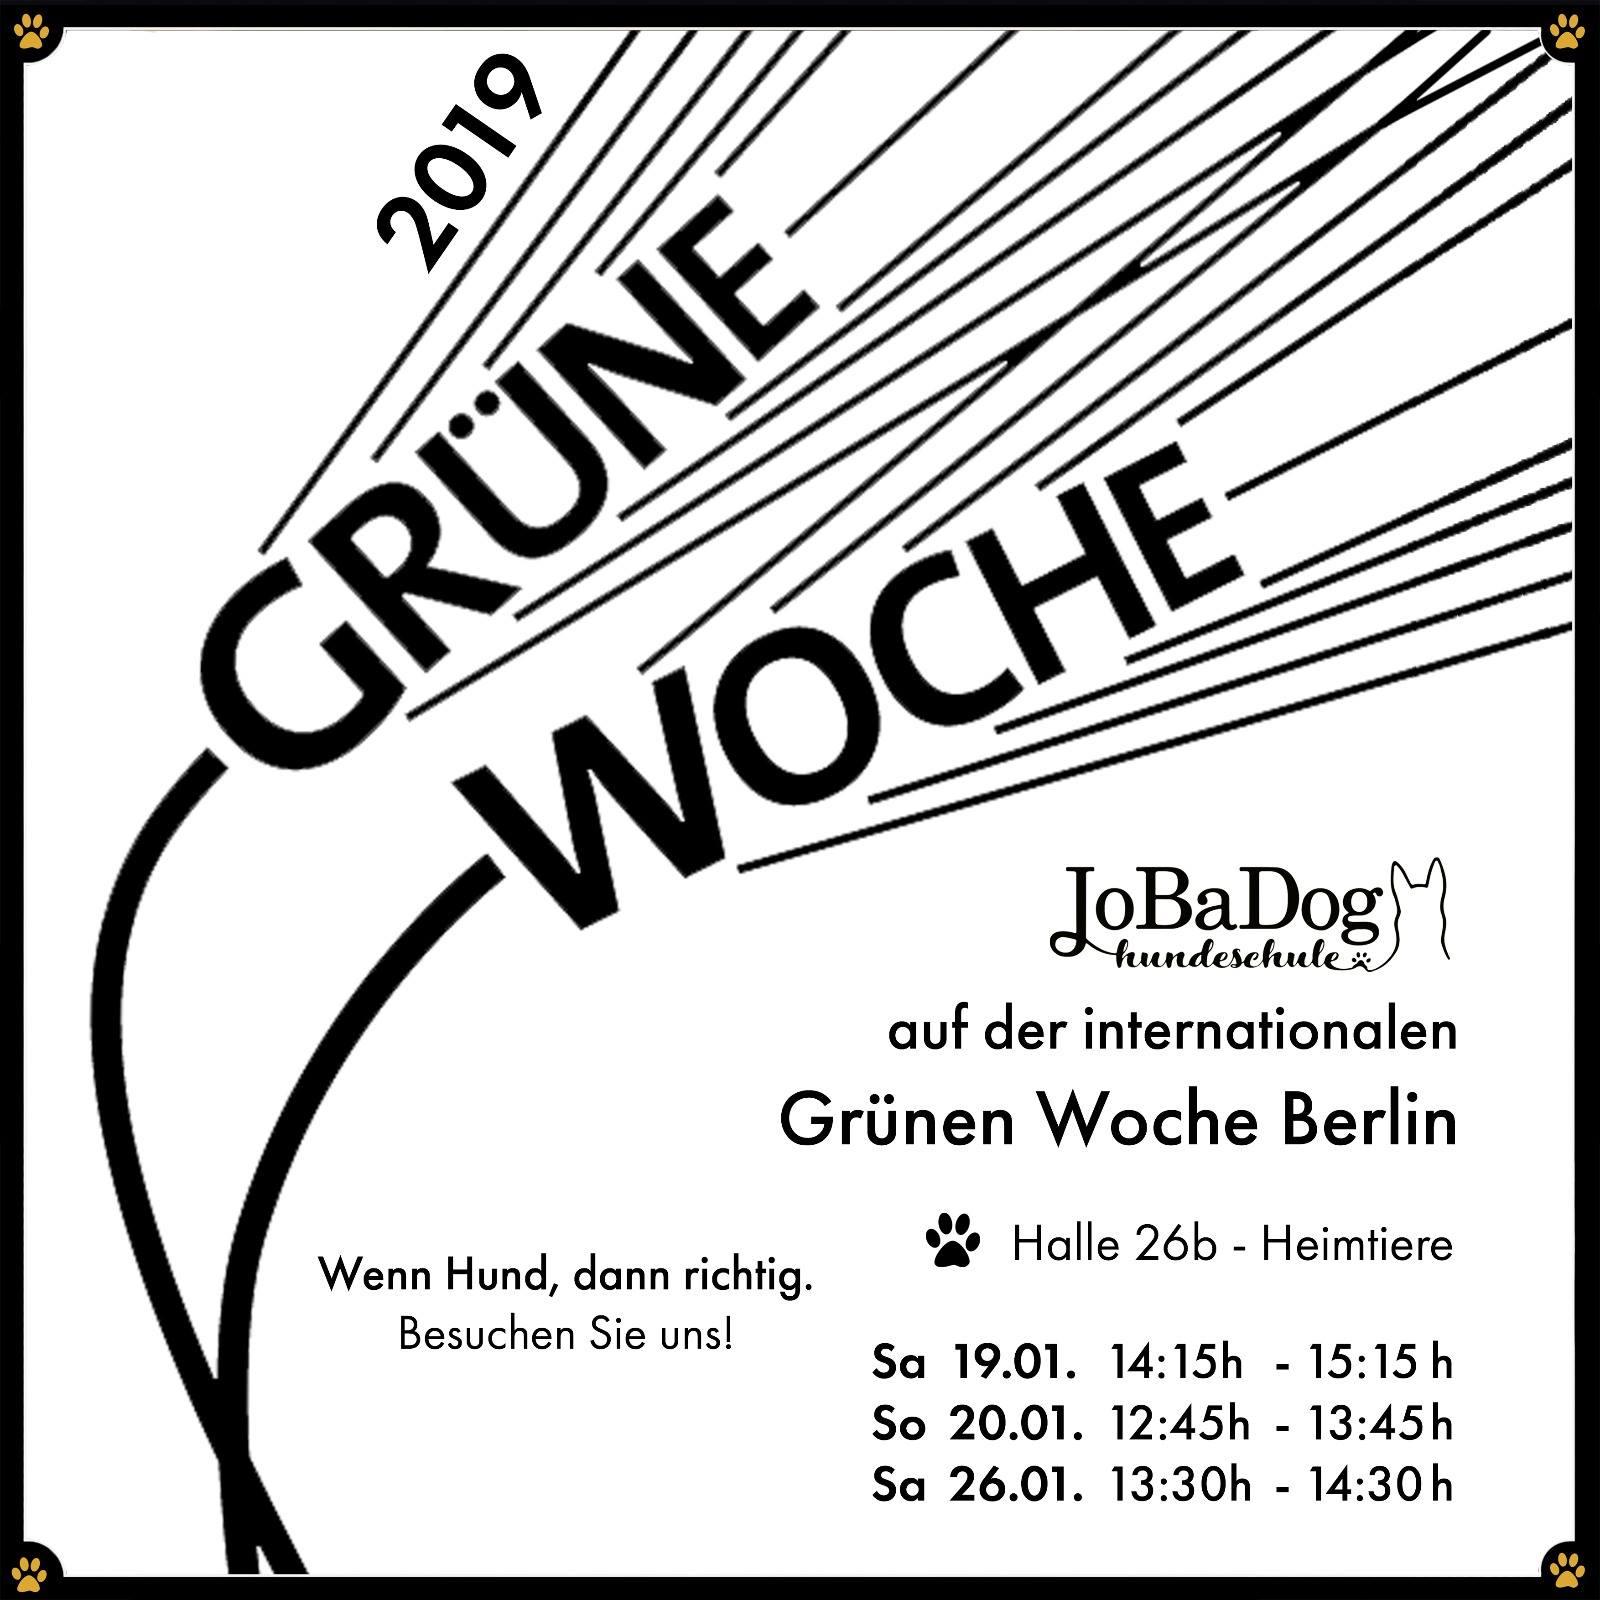 JoBaDog_Gruene_Woche_2019_Flyer.jpg